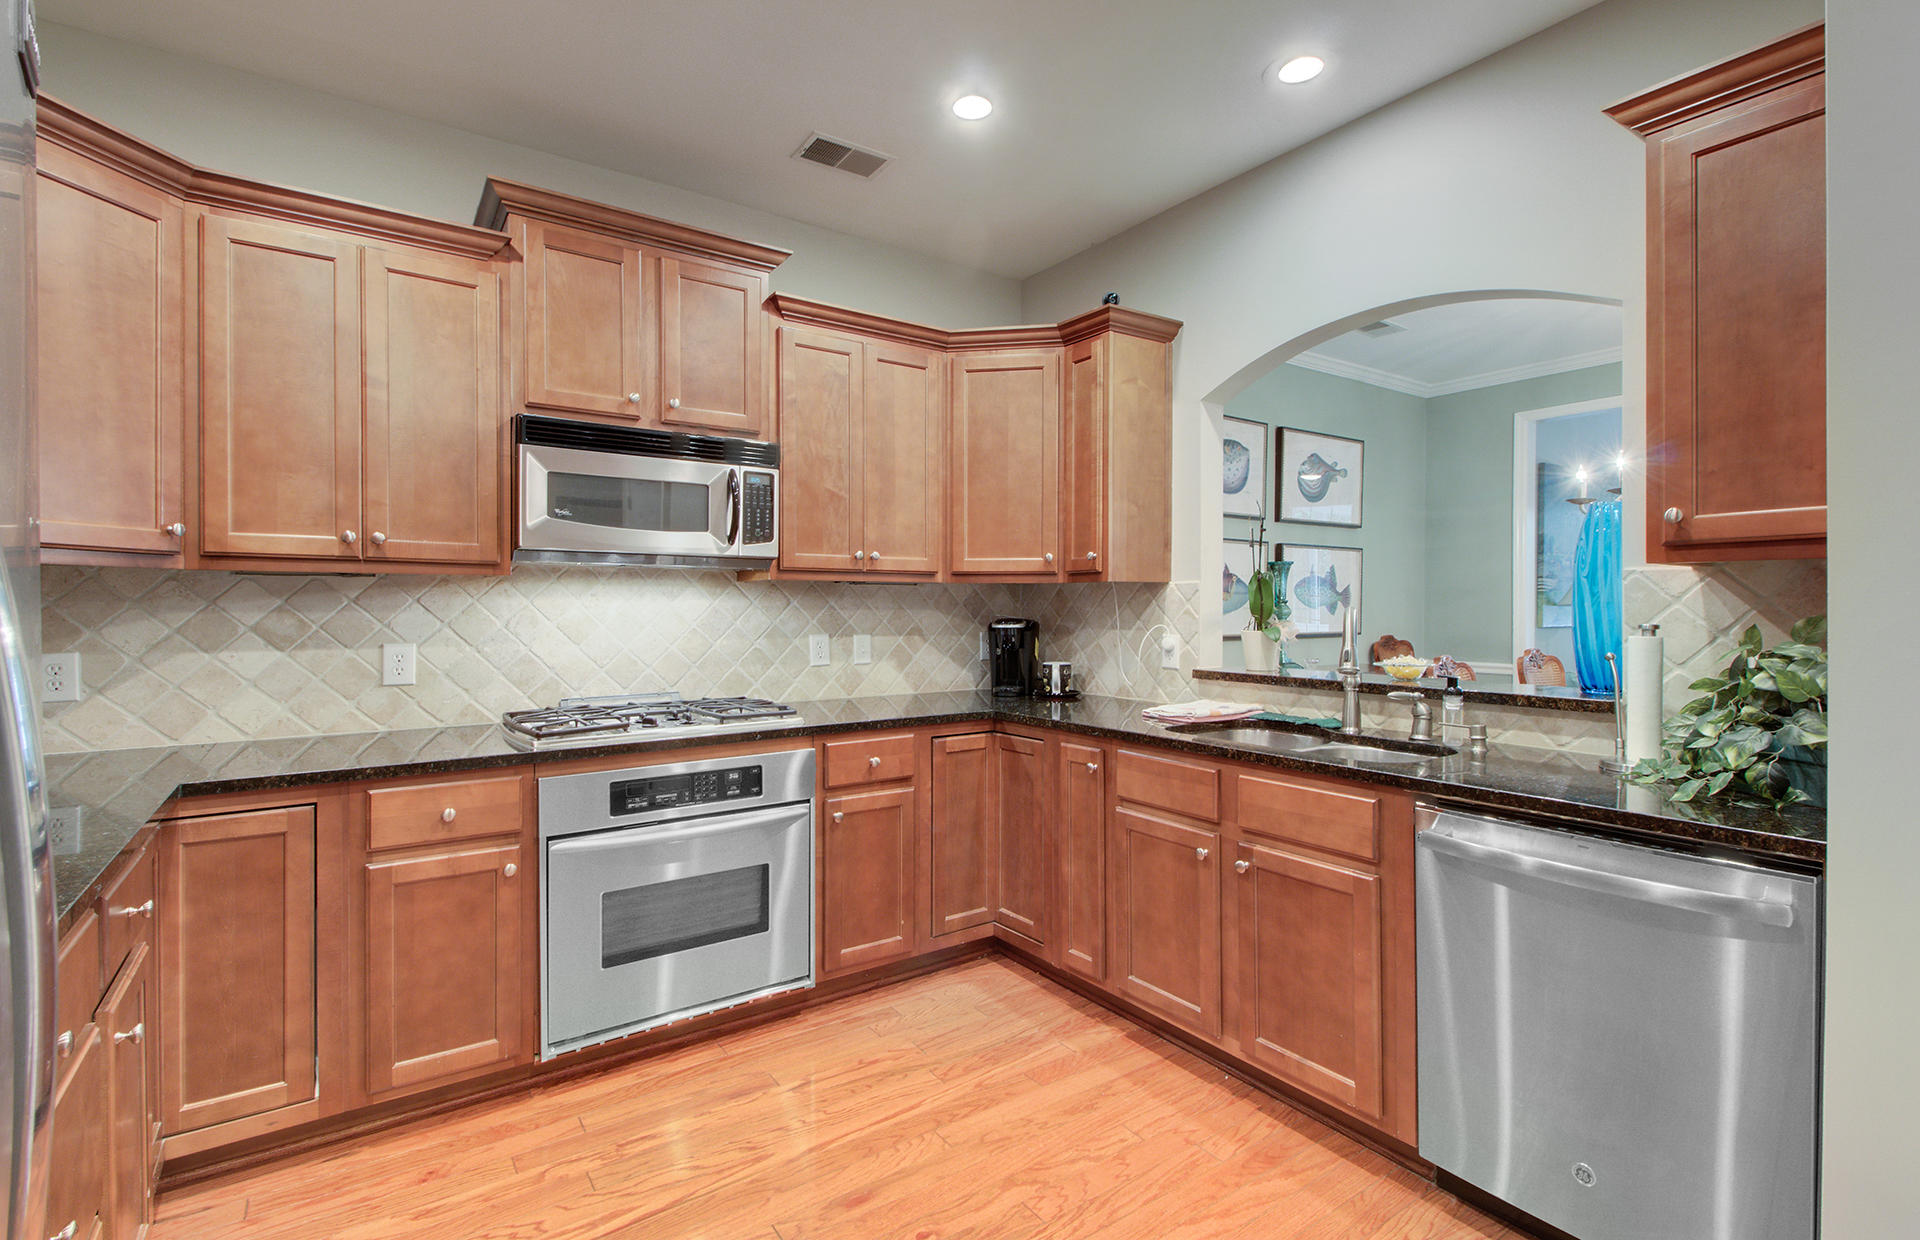 Dunes West Homes For Sale - 145 Fresh Meadow, Mount Pleasant, SC - 10